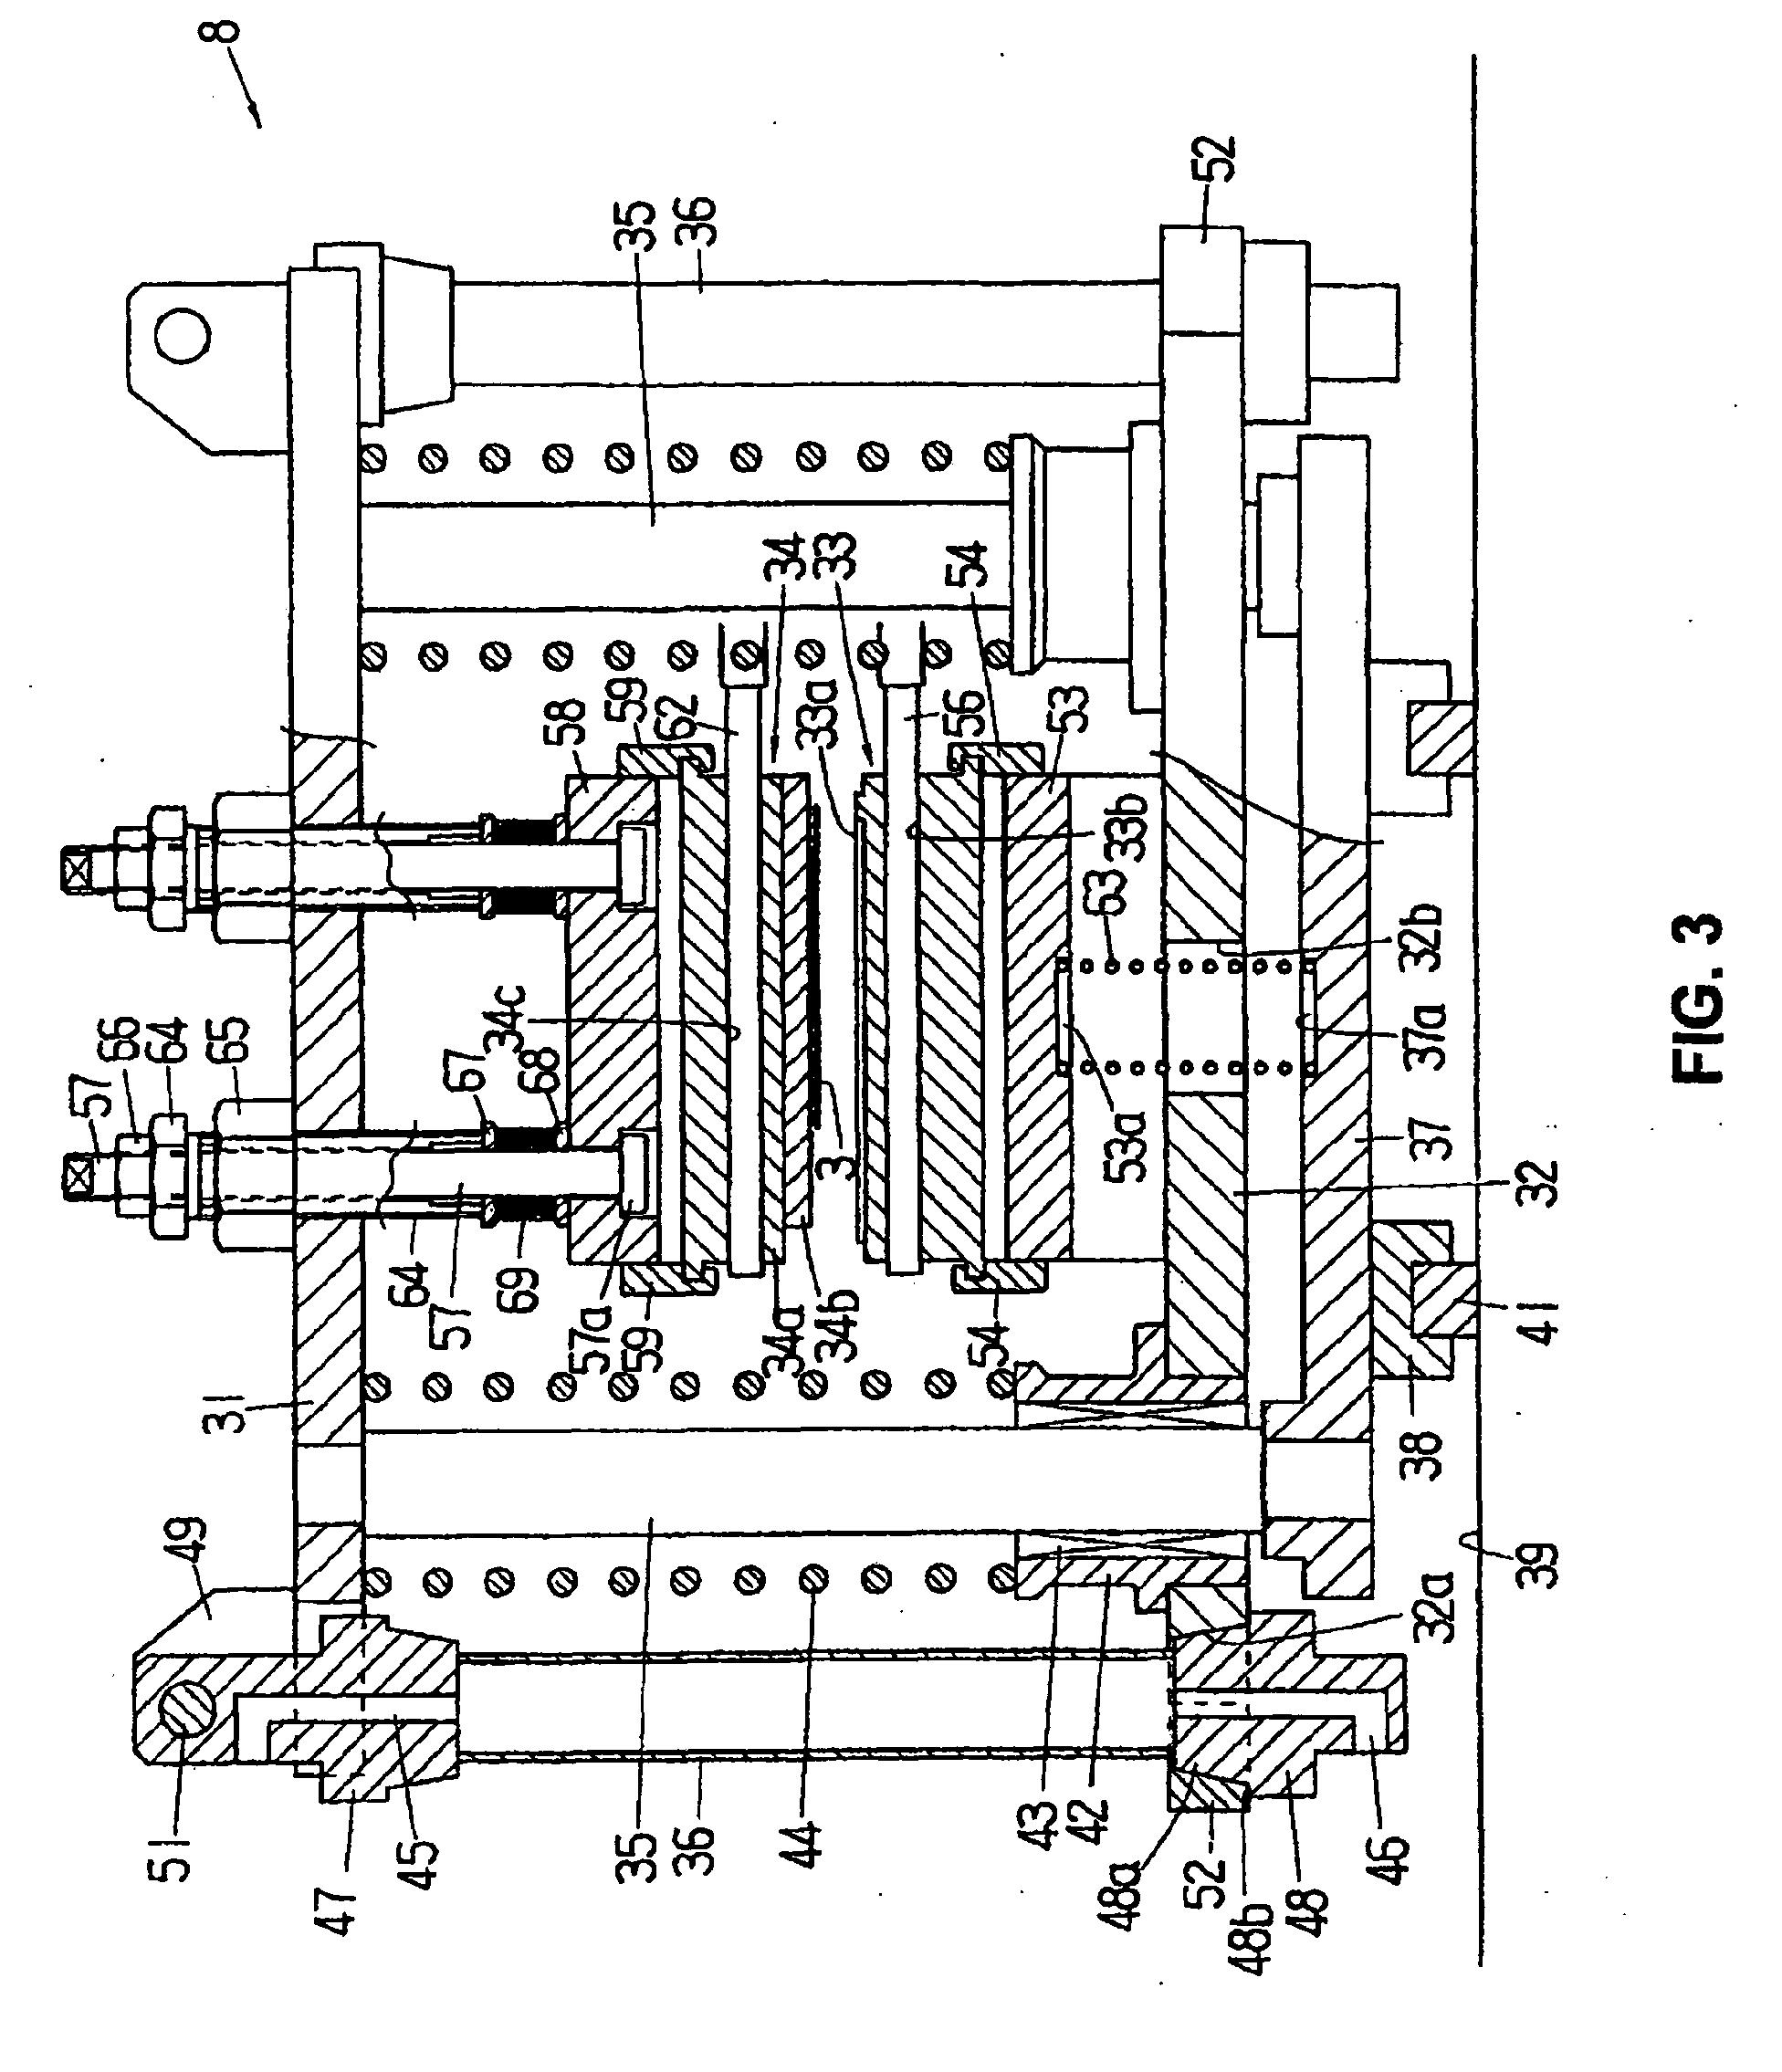 专利ep1457306a2 - a bag sealing apparatus